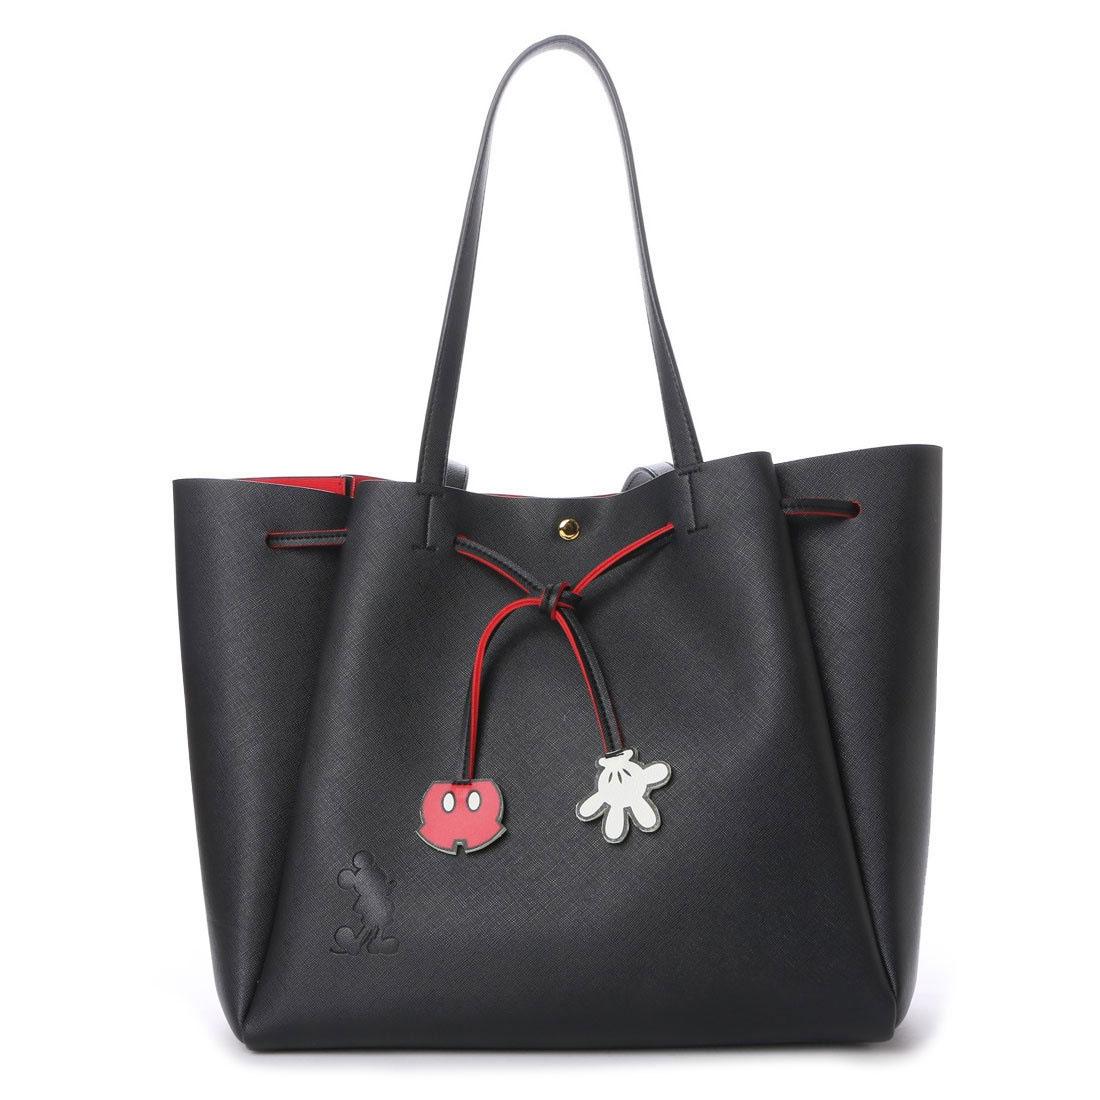 Women Bag Cartoon Mickey Minnie Handbag Pu Leather Shoulder Bag For Women 2019 Female Bag Large Capacity Tote Bolsa Feminina